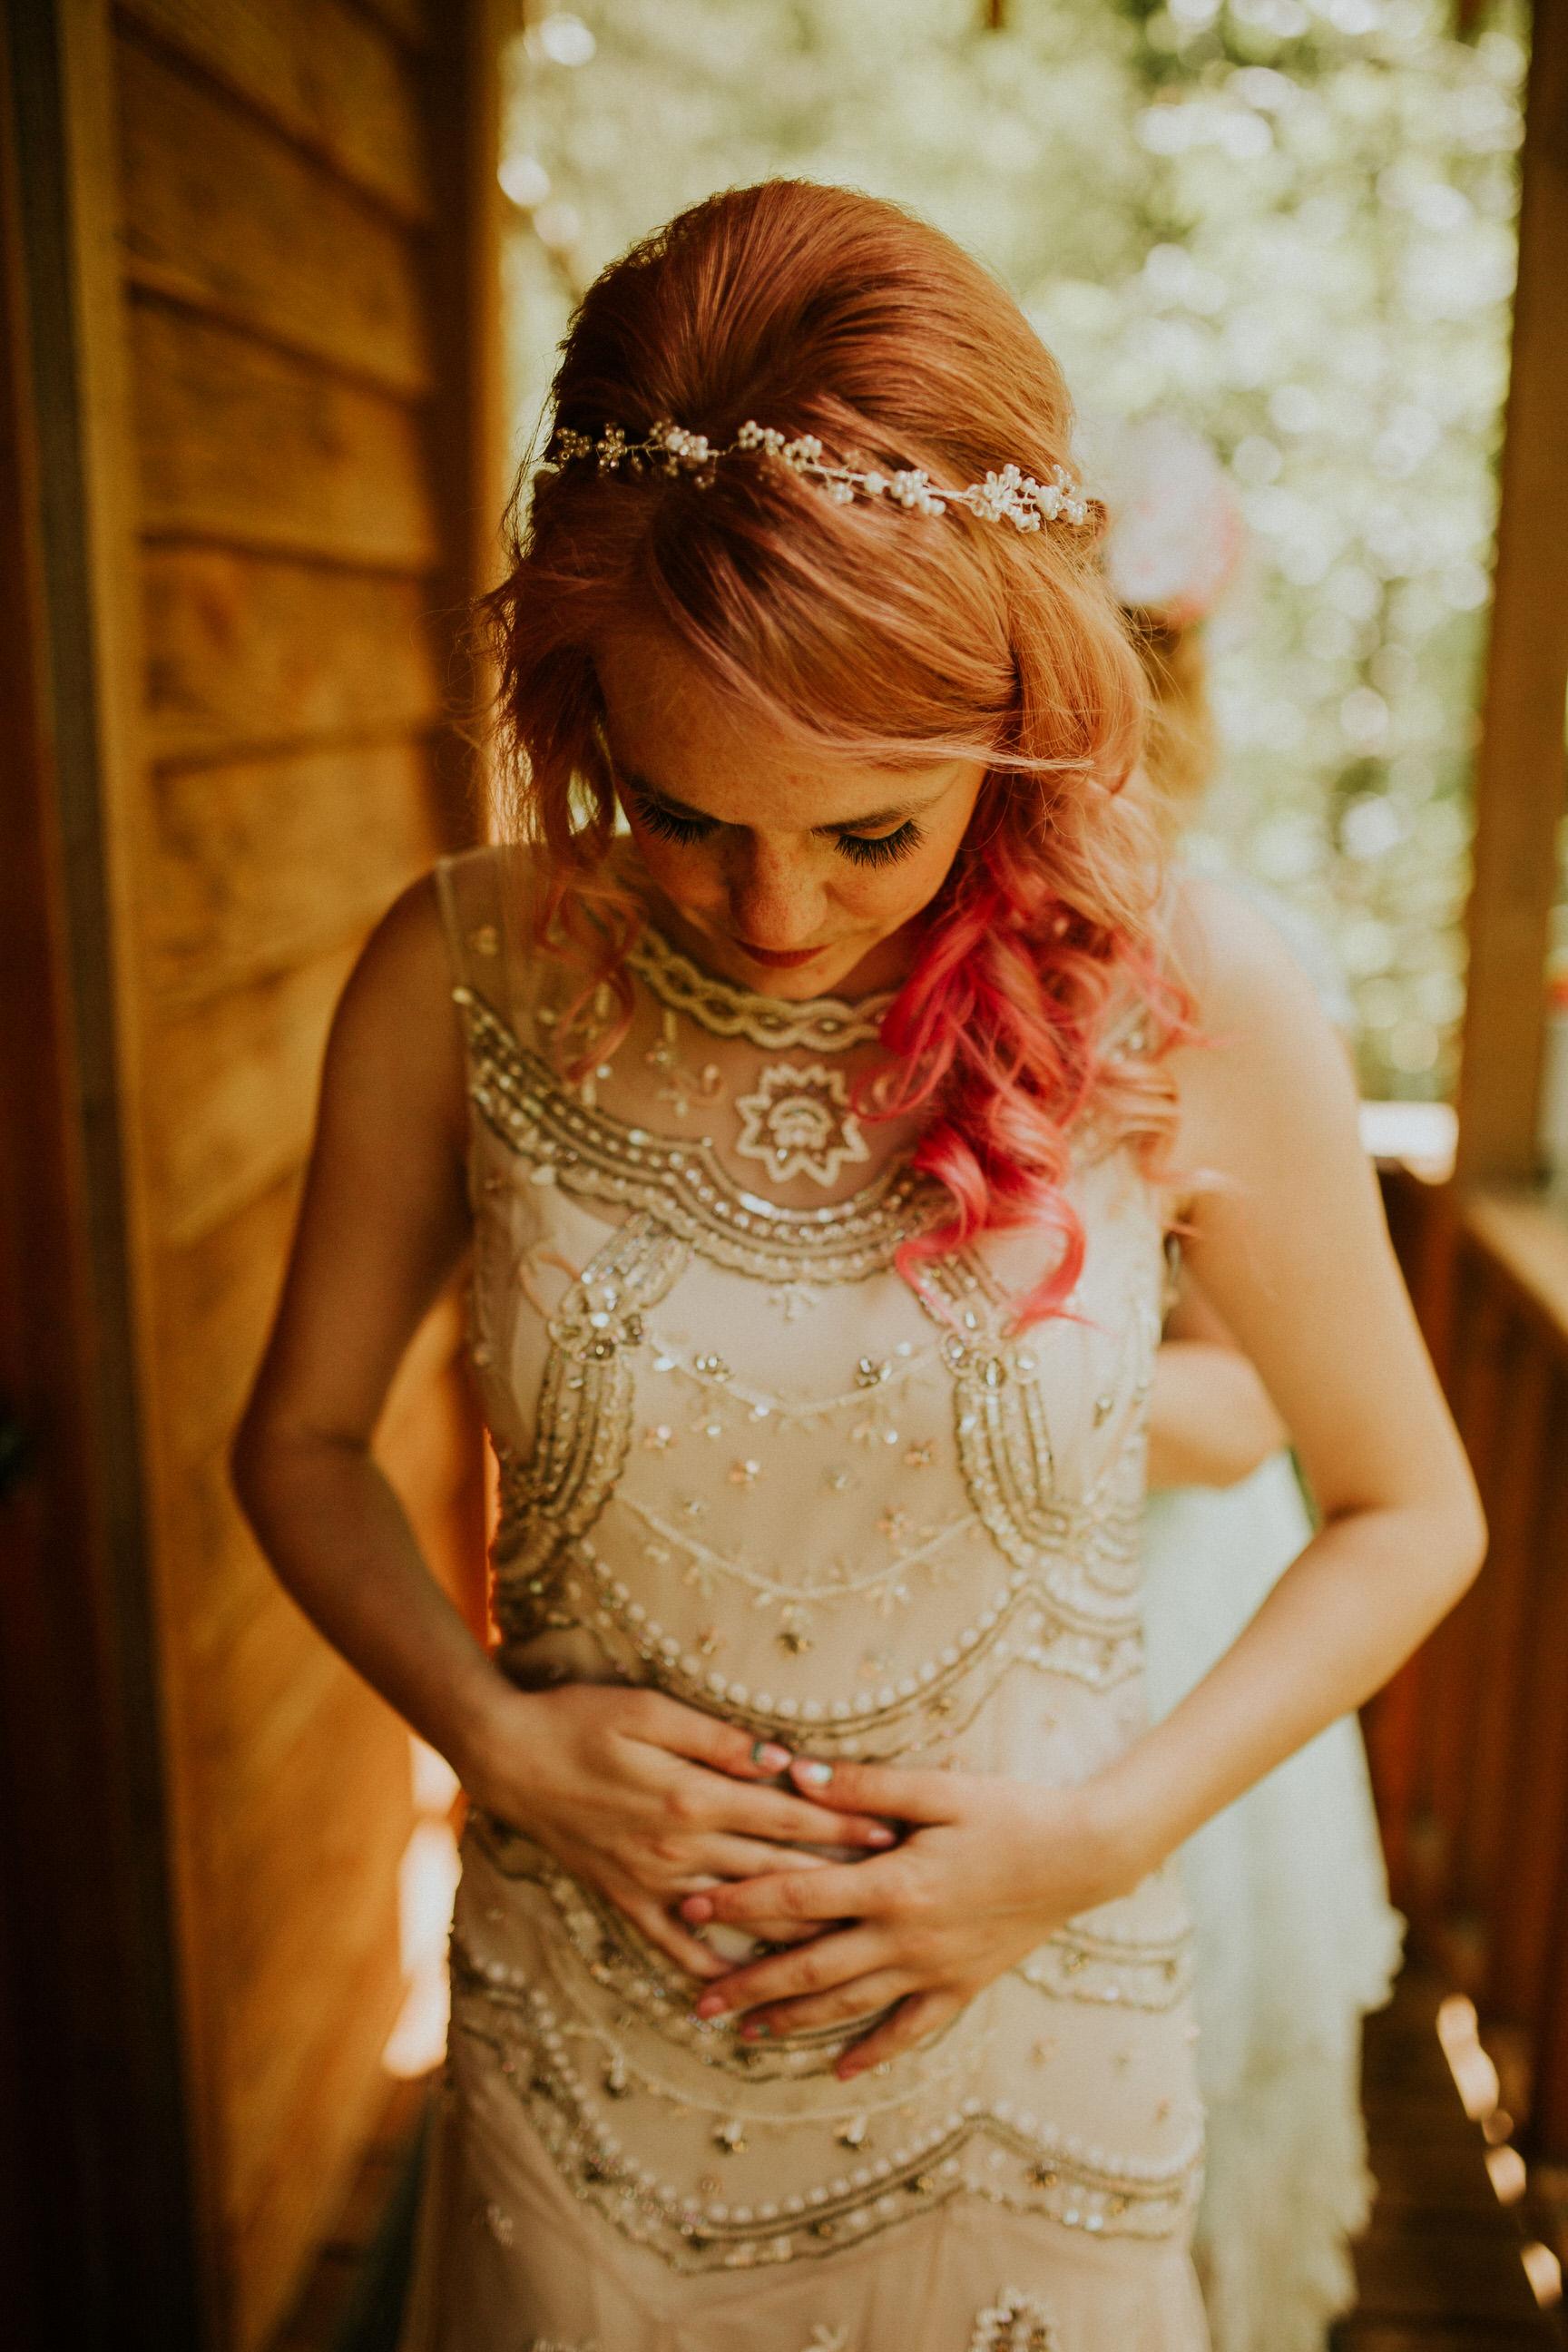 seattle elopement photographer by breeanna lasher